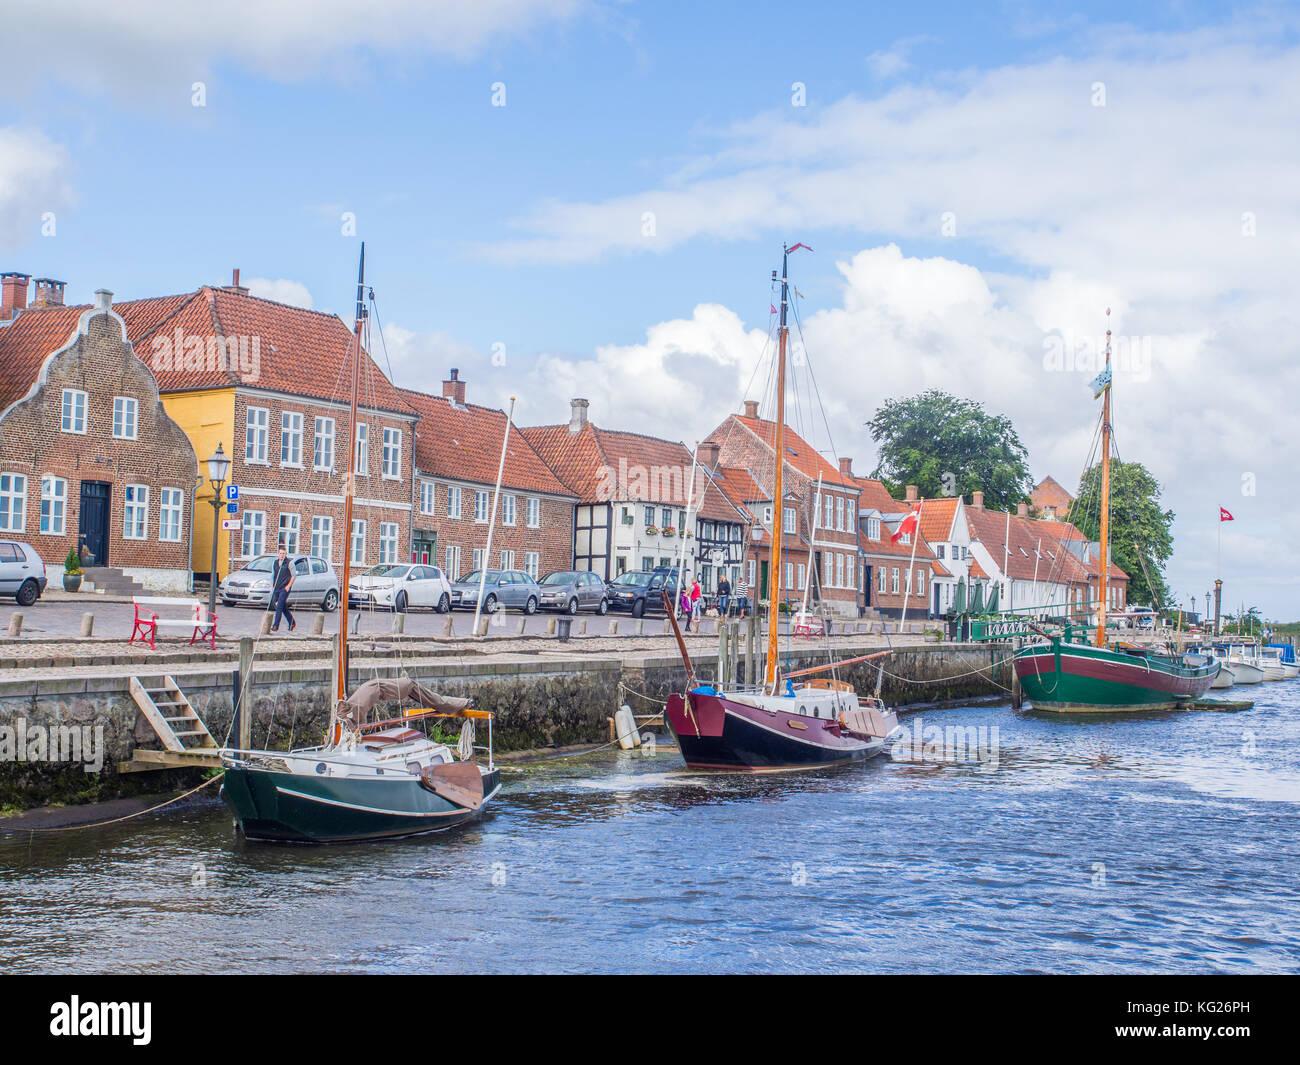 Die Ribe riverfront Wharf, Ribe, Jütland, Dänemark, Europa Stockbild